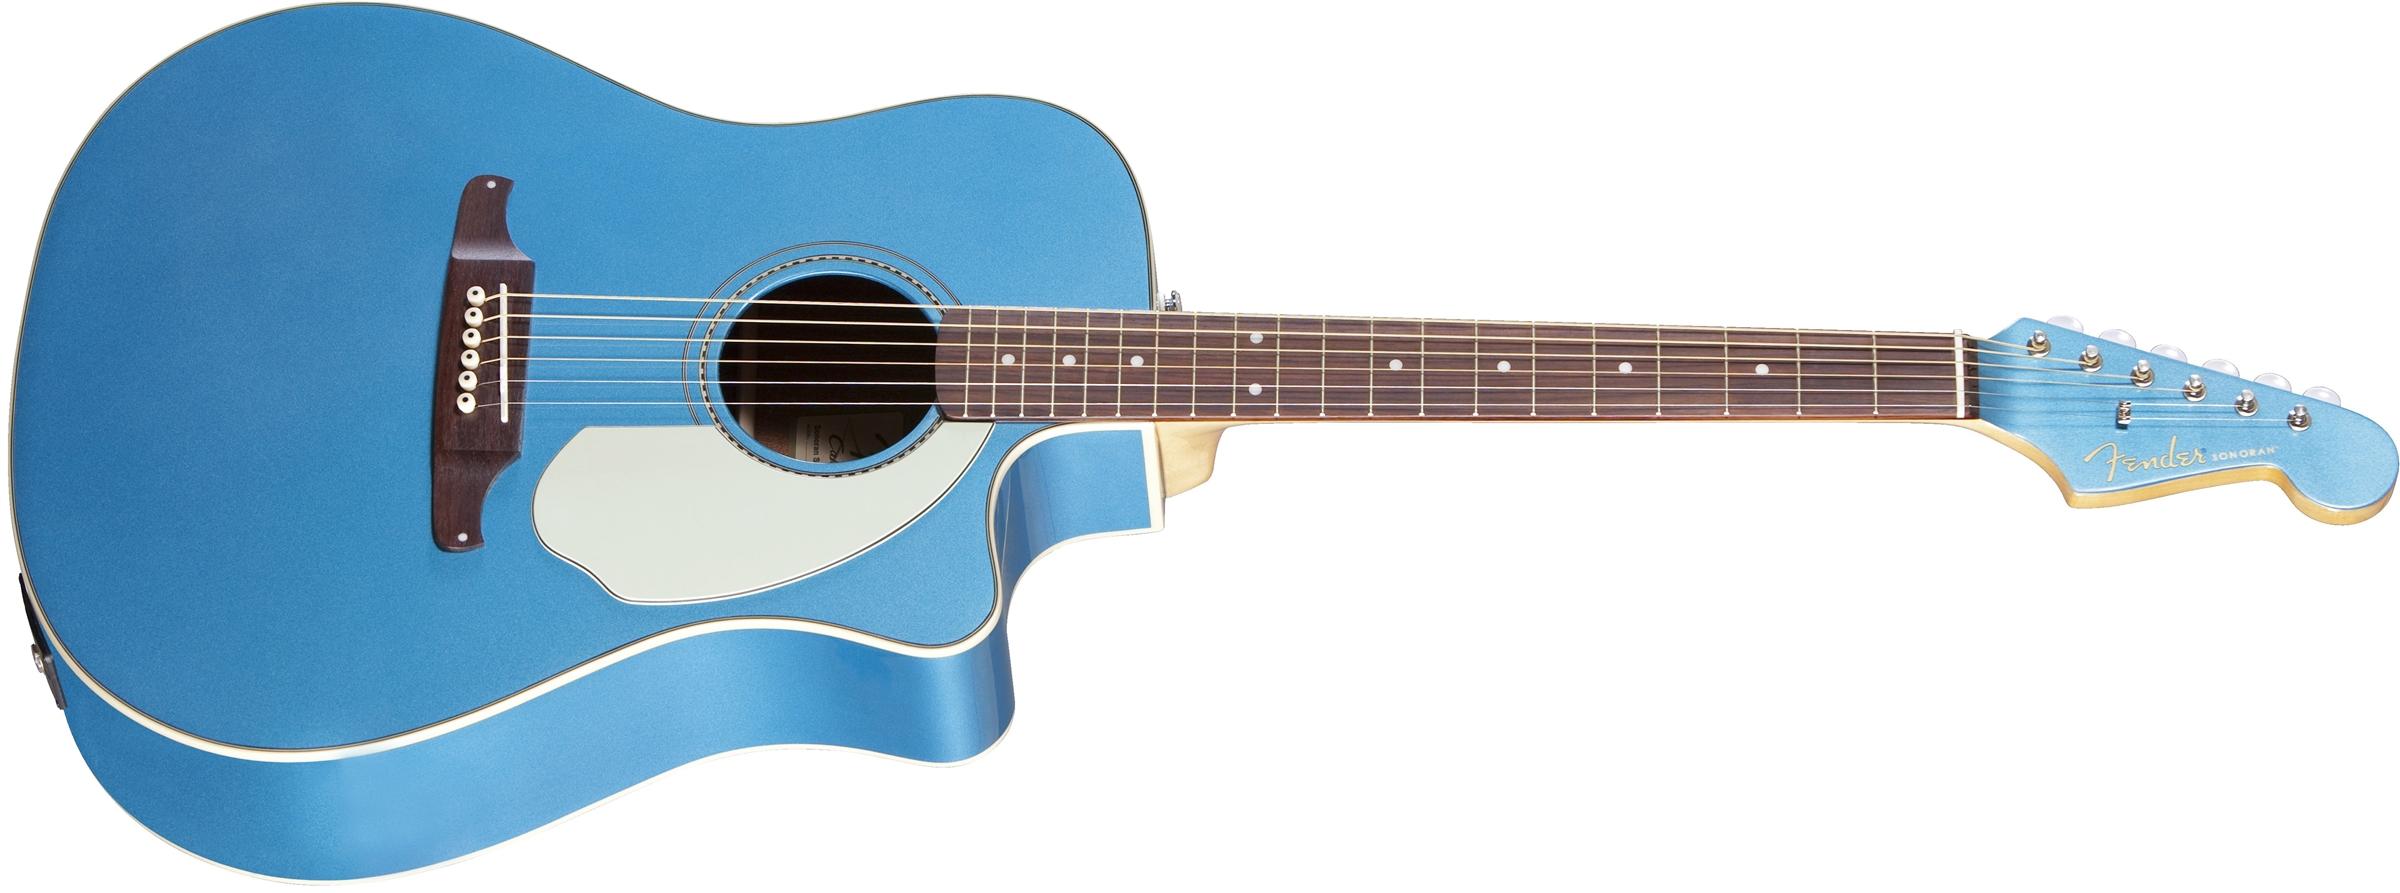 fender sonoran sce lake placid blue cutaway dreadnought acoustic electric guitar jim laabs. Black Bedroom Furniture Sets. Home Design Ideas